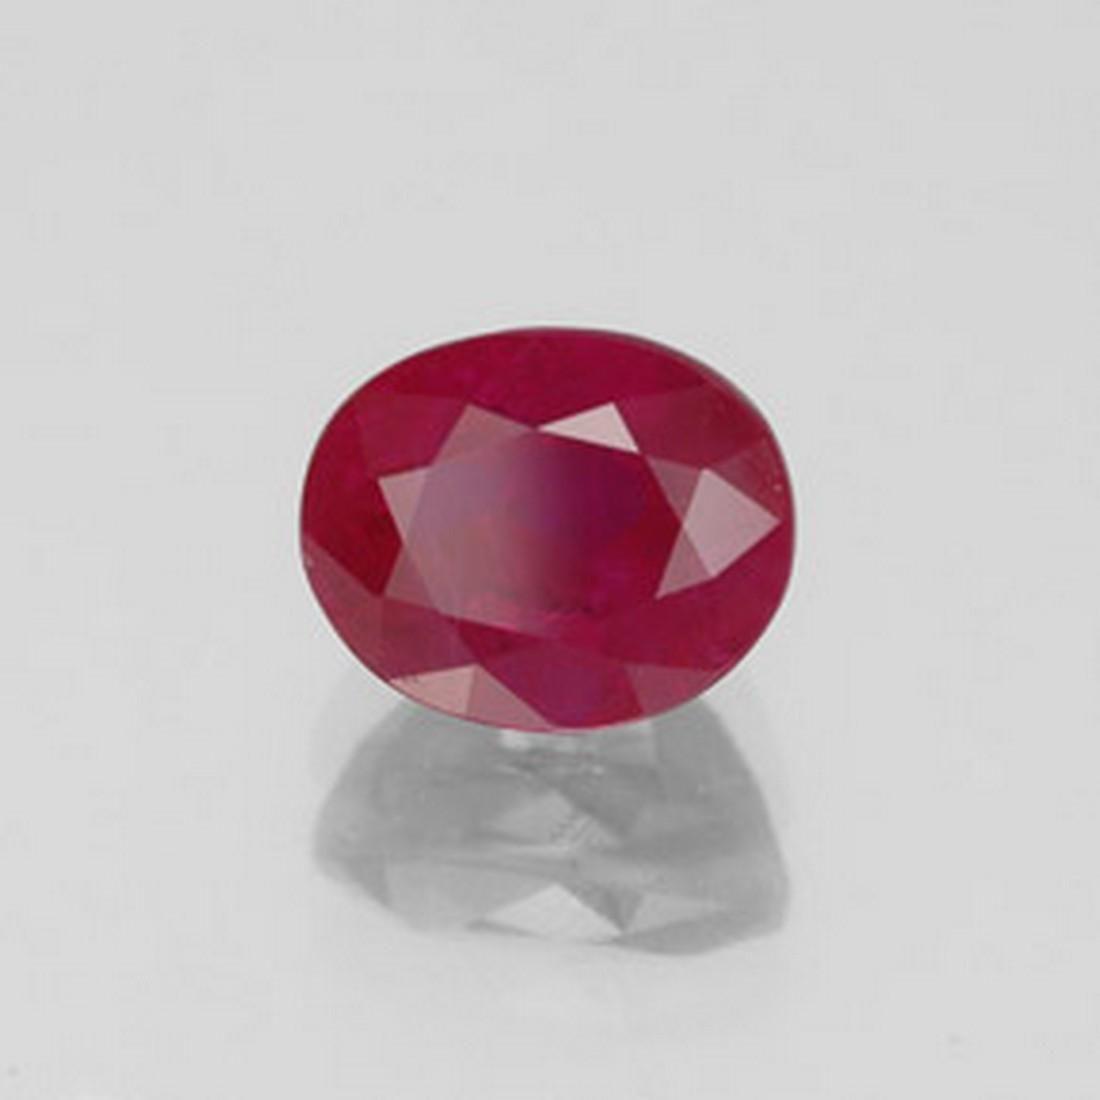 natural ruby igi report unheated-9,34 ct 1,2,3